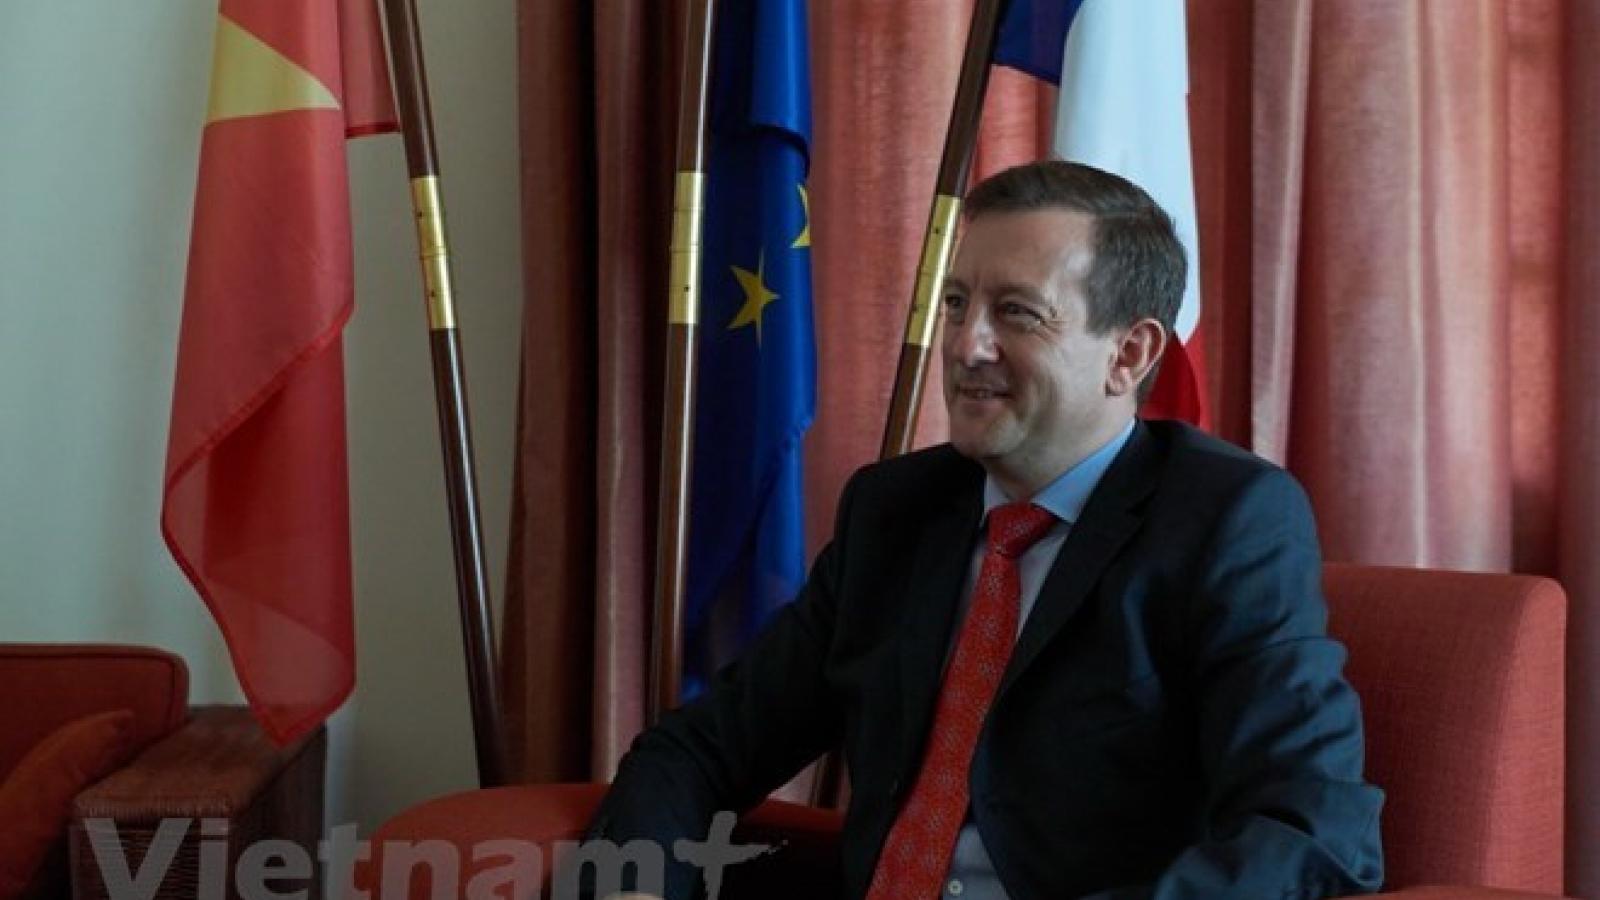 French ambassador highlights growing Vietnam-France ties